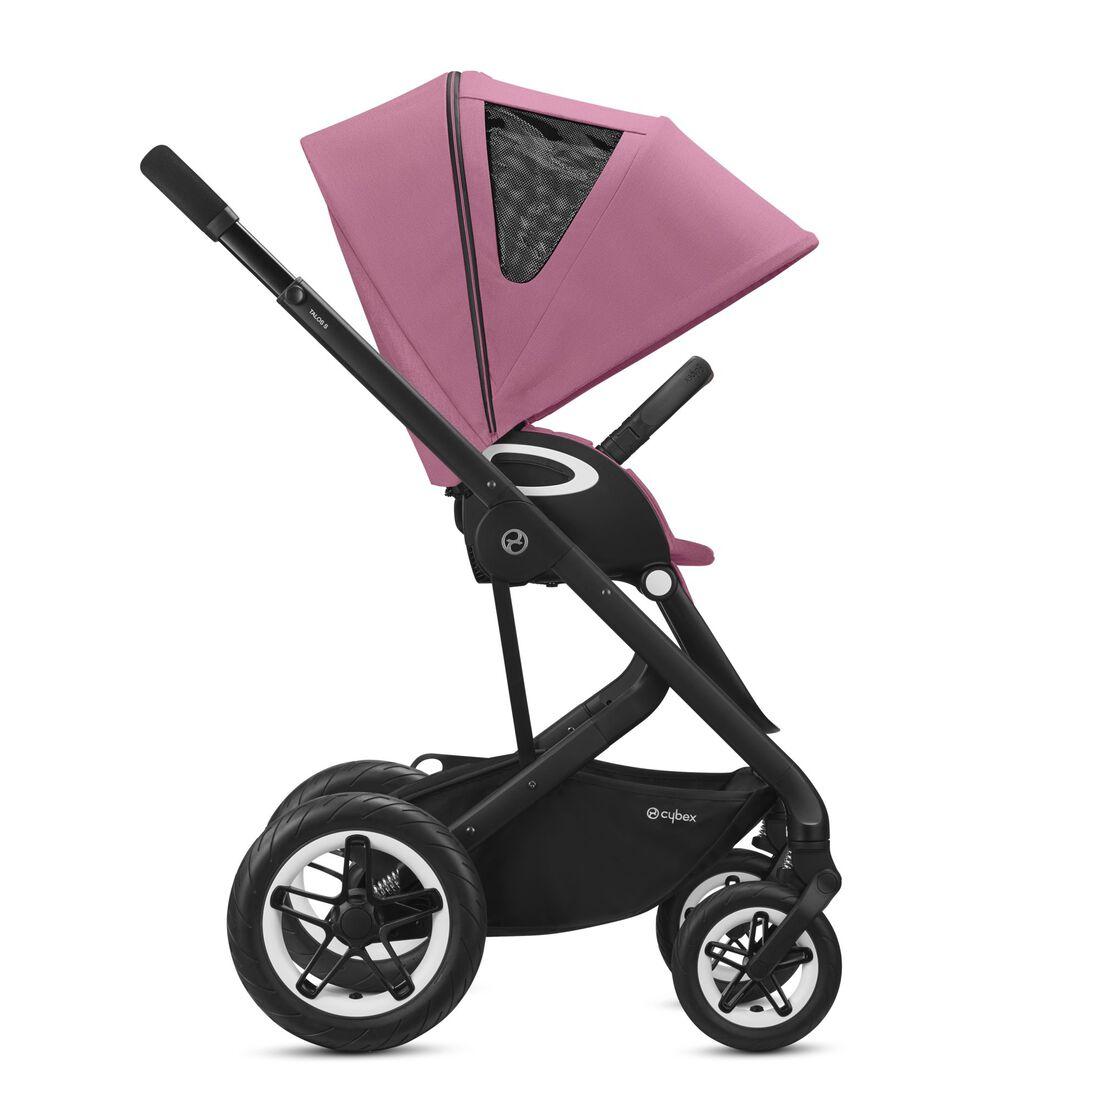 CYBEX Talos S Lux - Magnolia Pink (Schwarzer Rahmen) in Magnolia Pink (Black Frame) large Bild 3